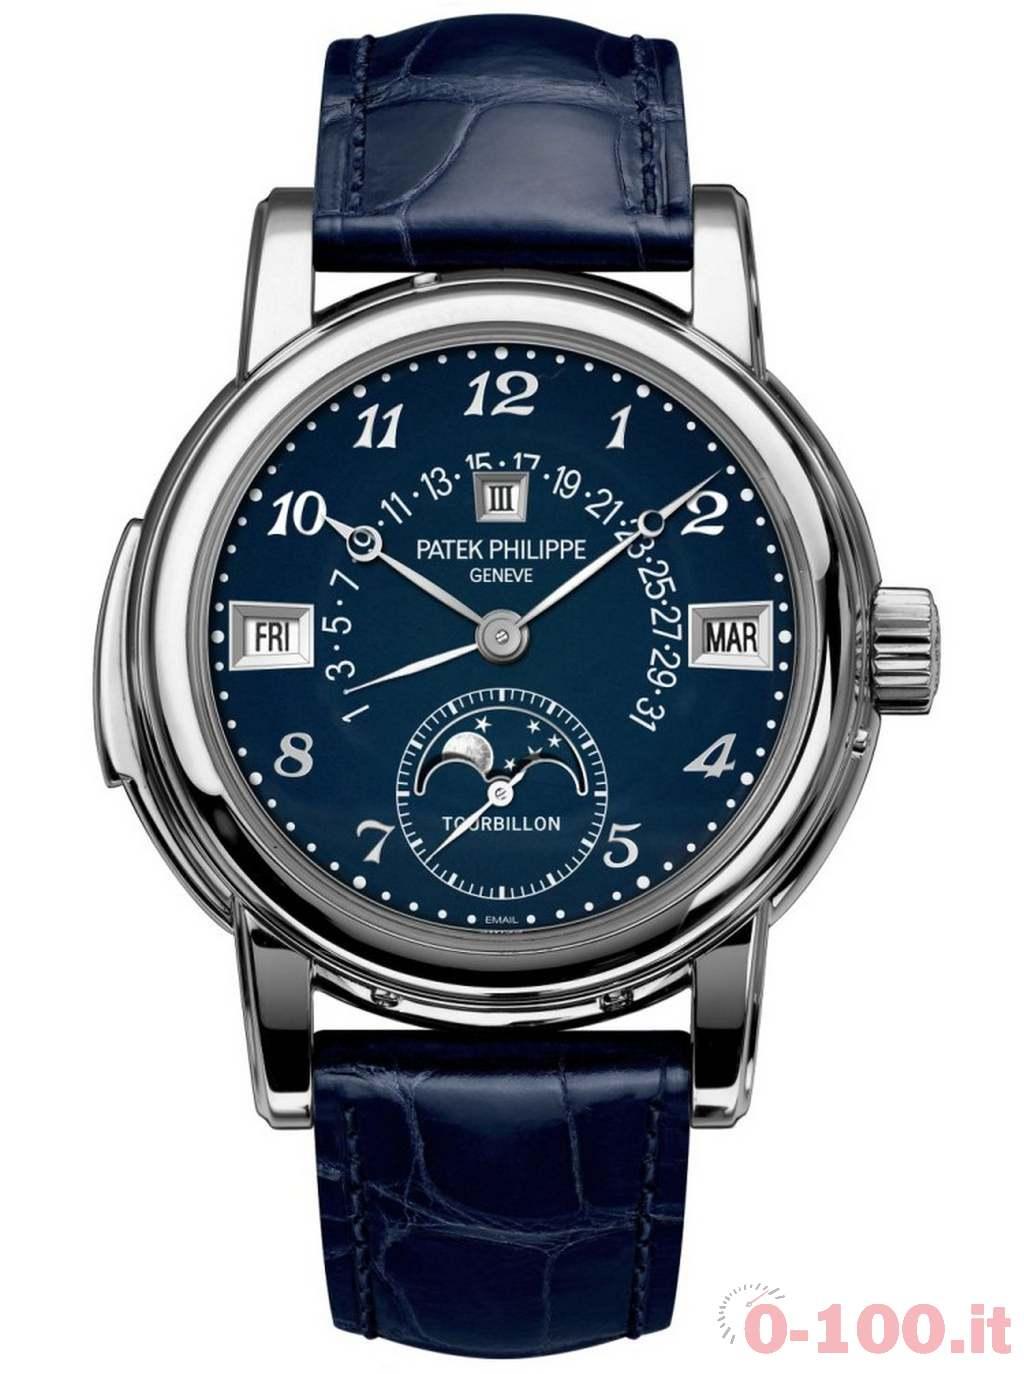 only-watch-2015-il-patek-philippe-5016a-prezzo-price_0-1004